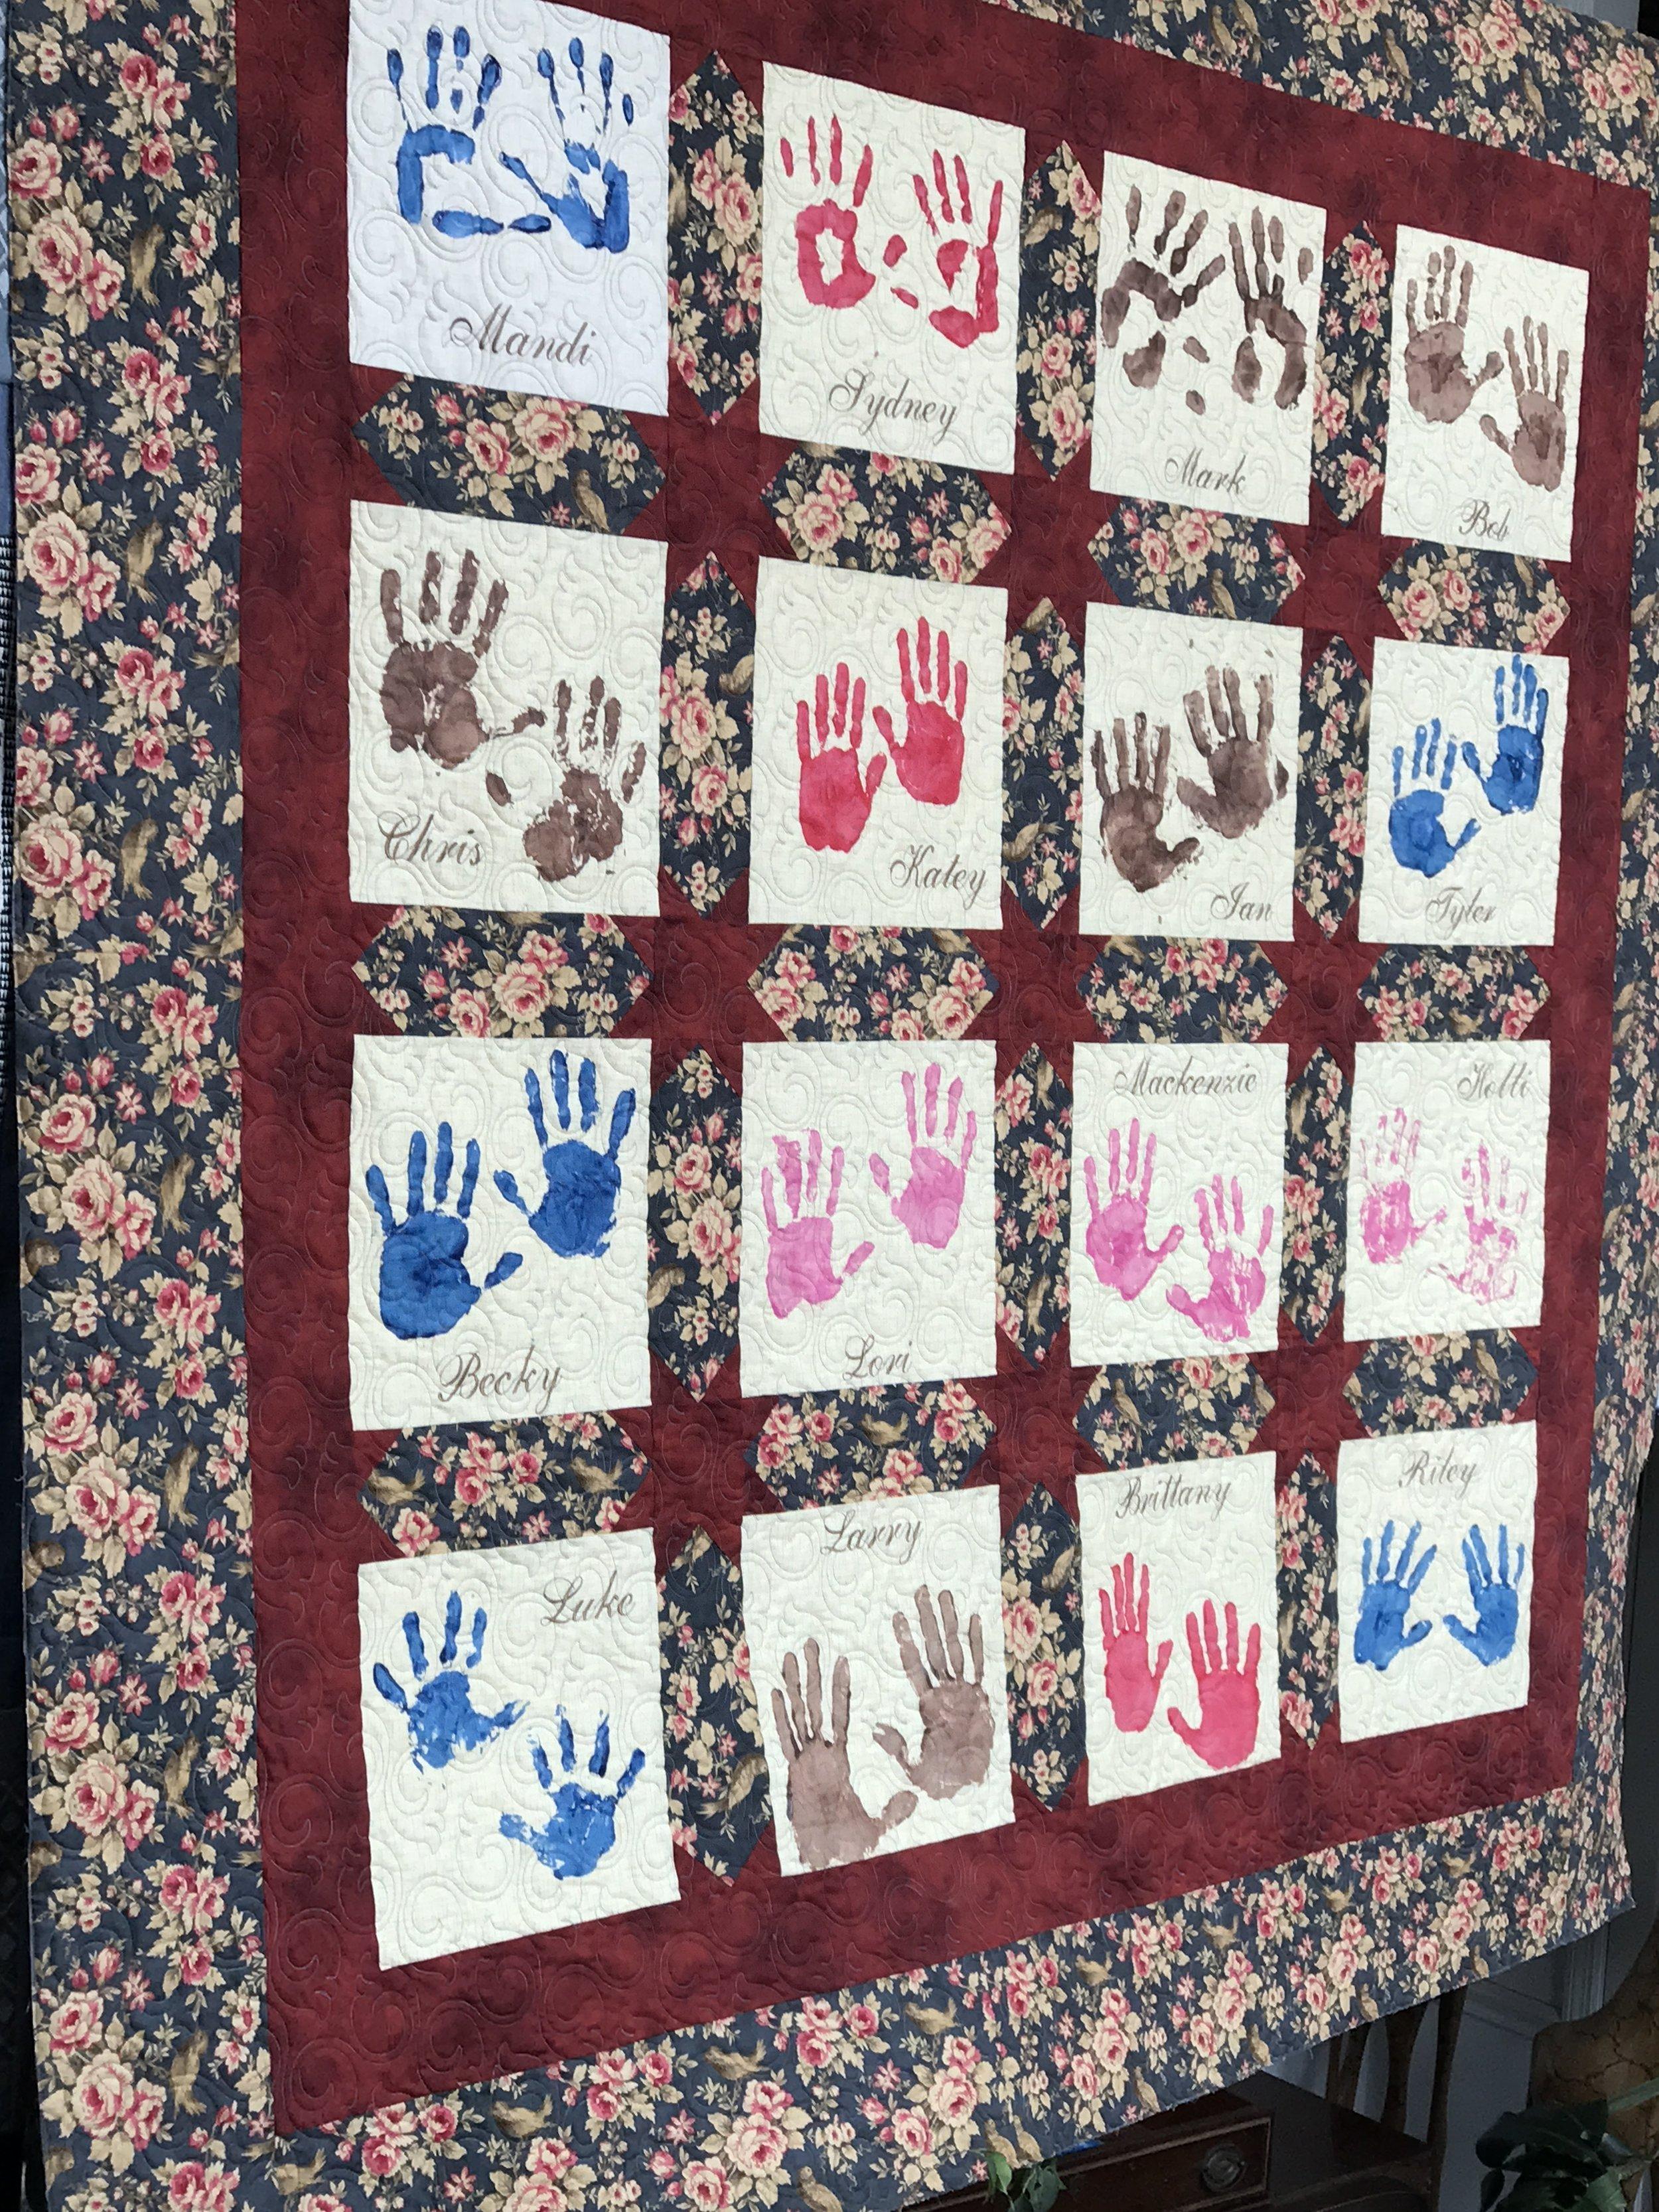 Memories. Hands. - main.JPG